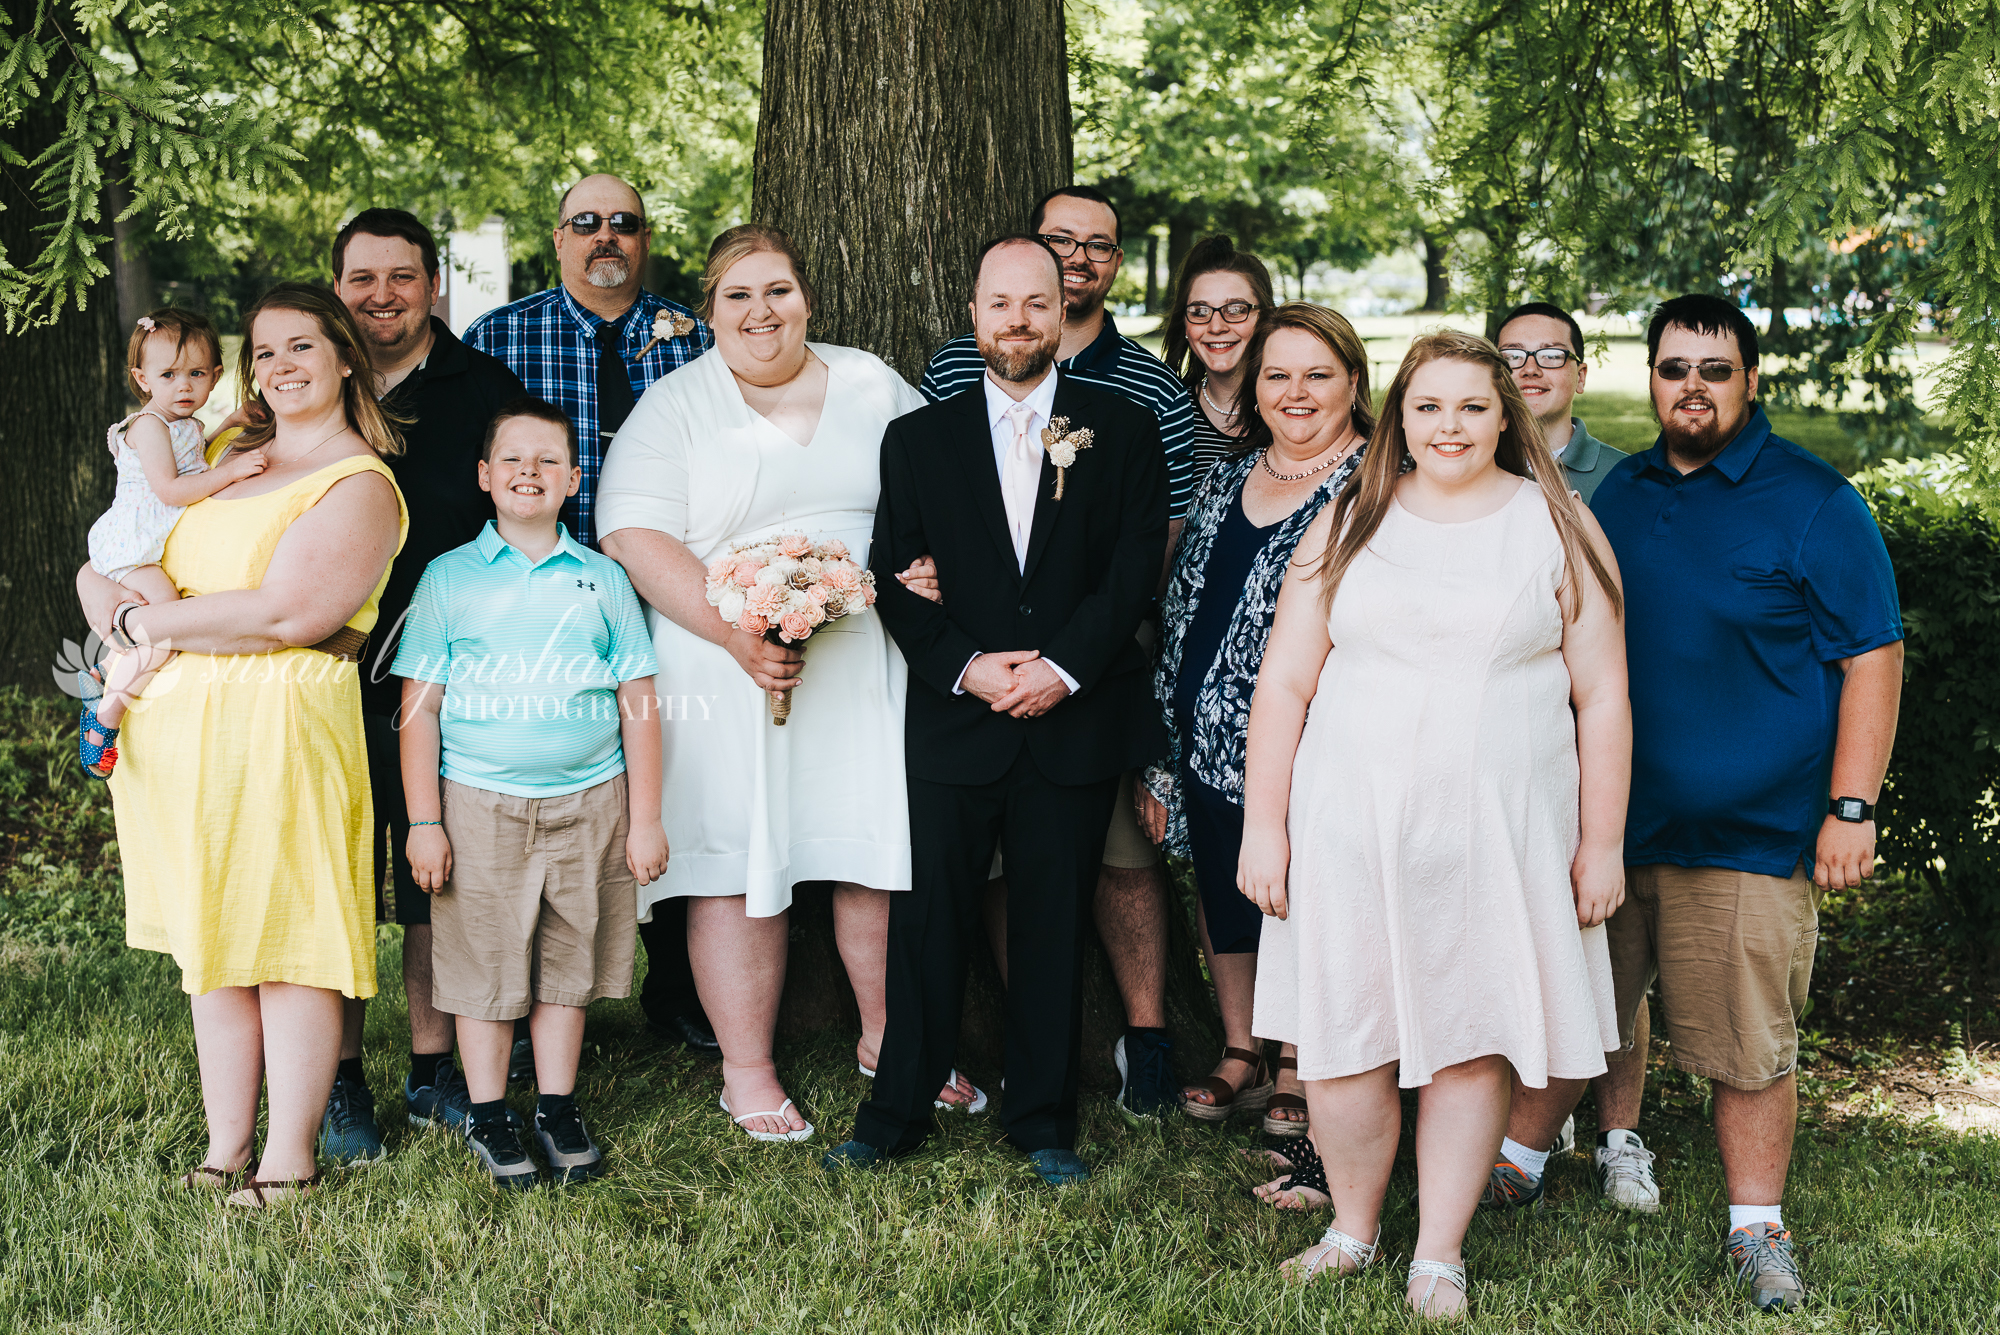 Bill and Sarah Wedding Photos 06-08-2019 SLY Photography -50.jpg